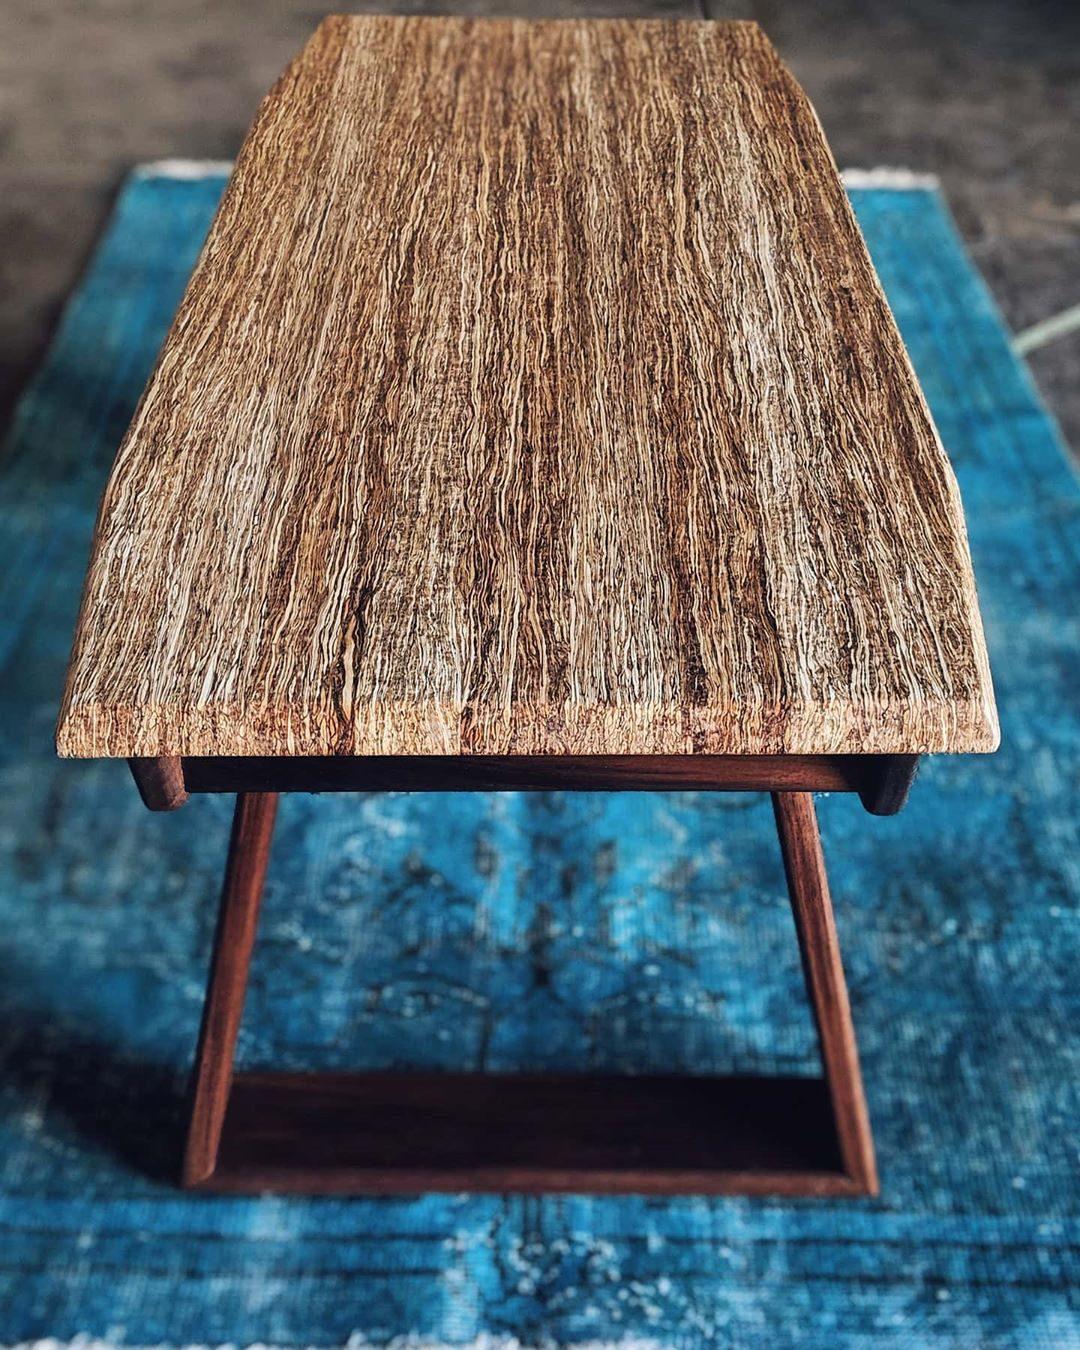 Hand crafted hemp table